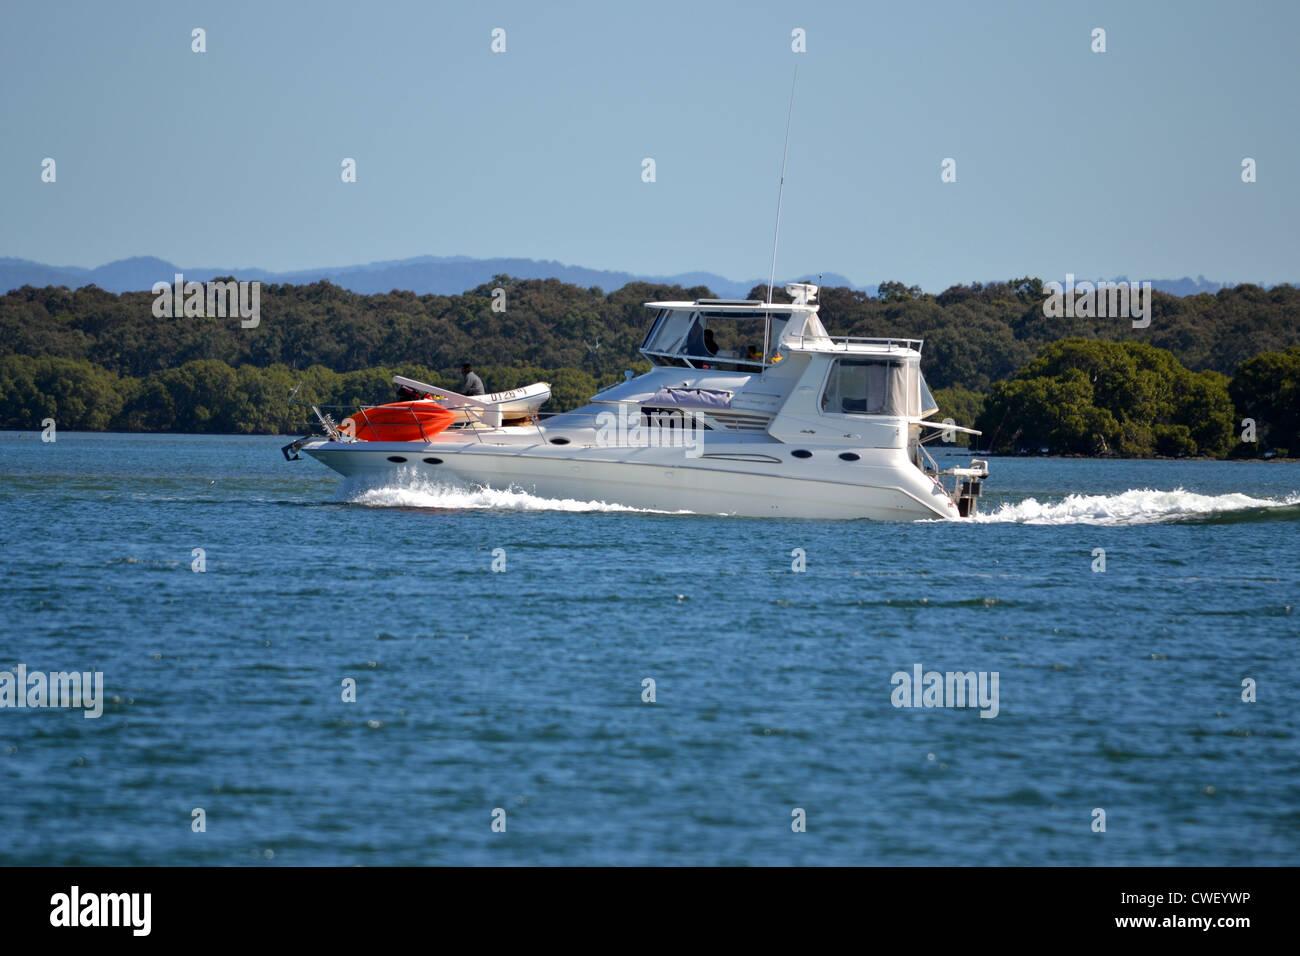 A yacht cruising along - Stock Image